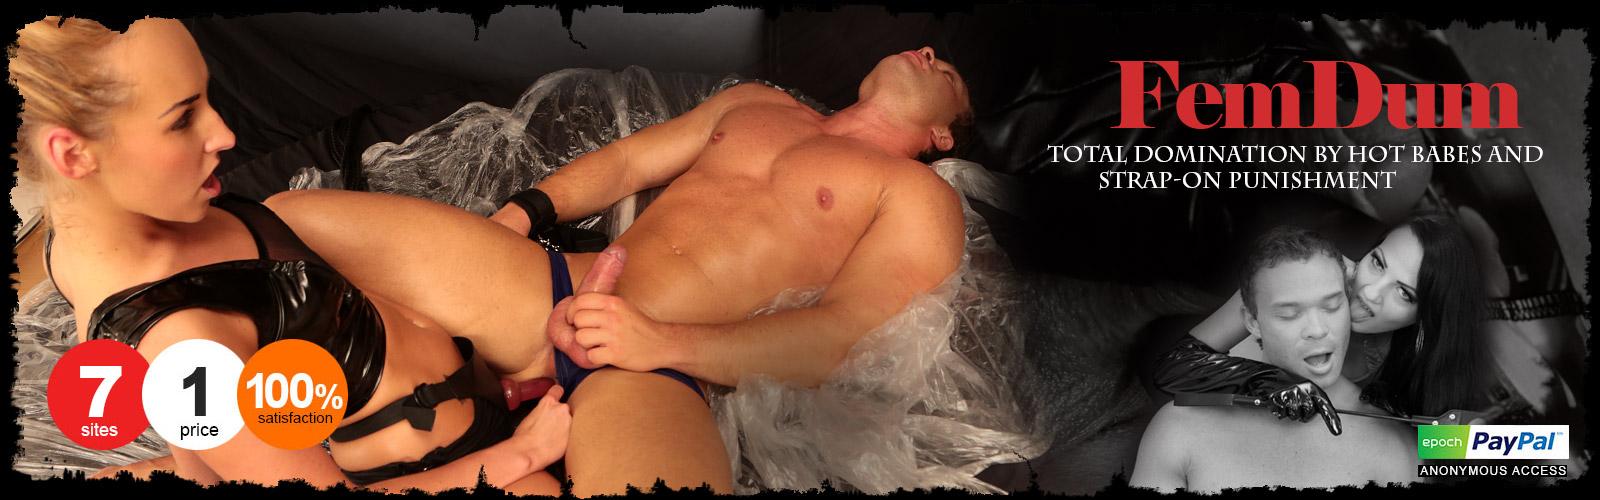 femdom strap-on punishment